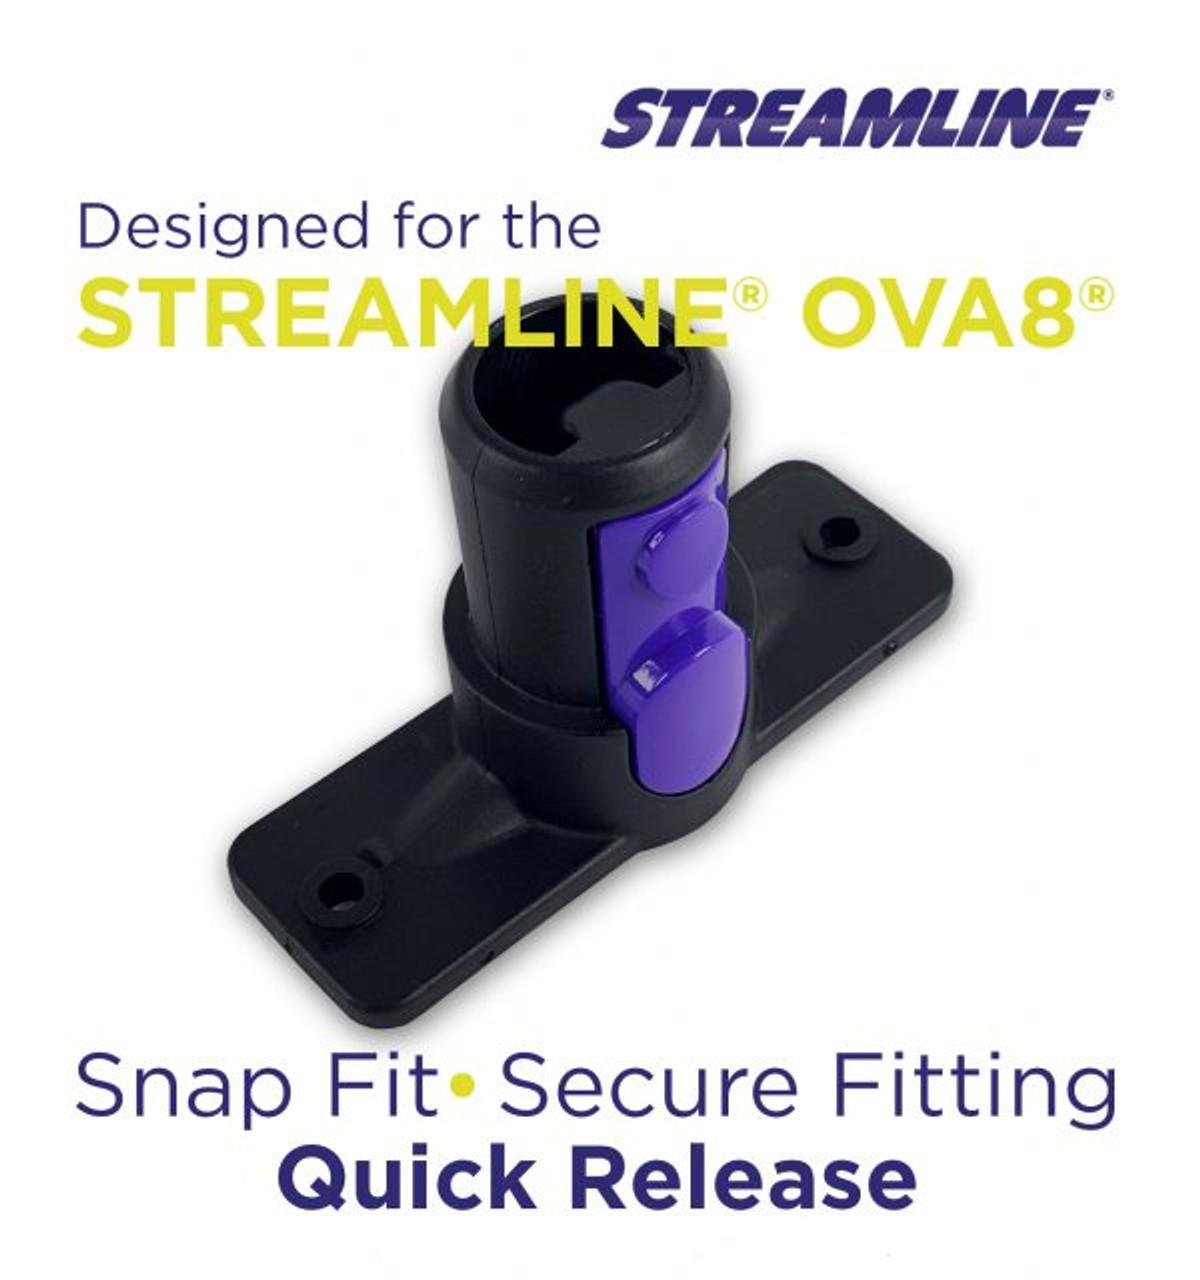 STREAMLINE® OVA8® Waterfed Pole Brush Socket – 90 DEGREE